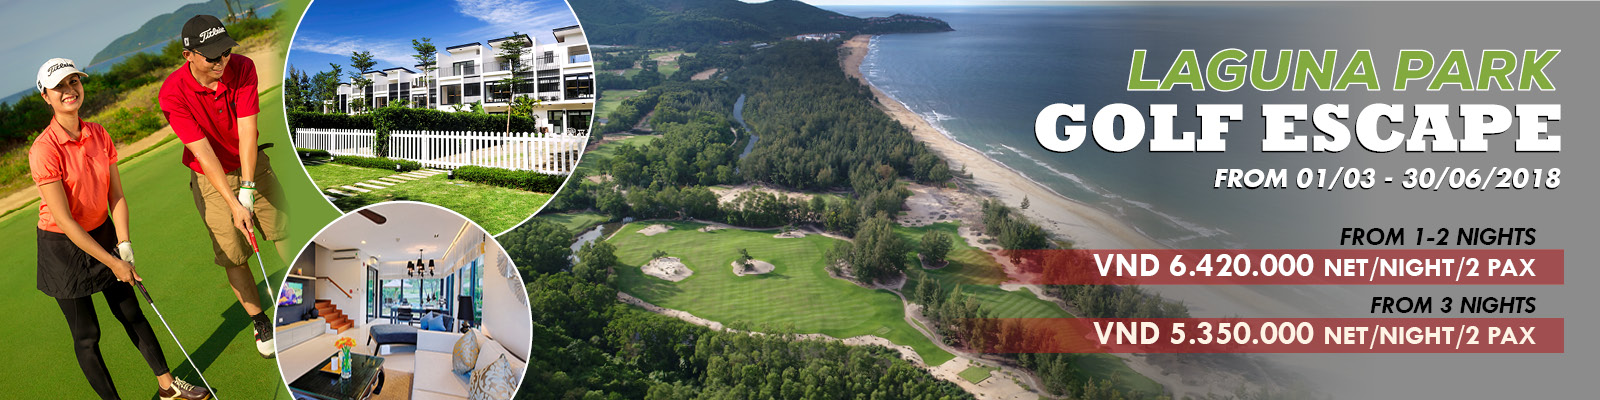 Laguna Park Golf Escape